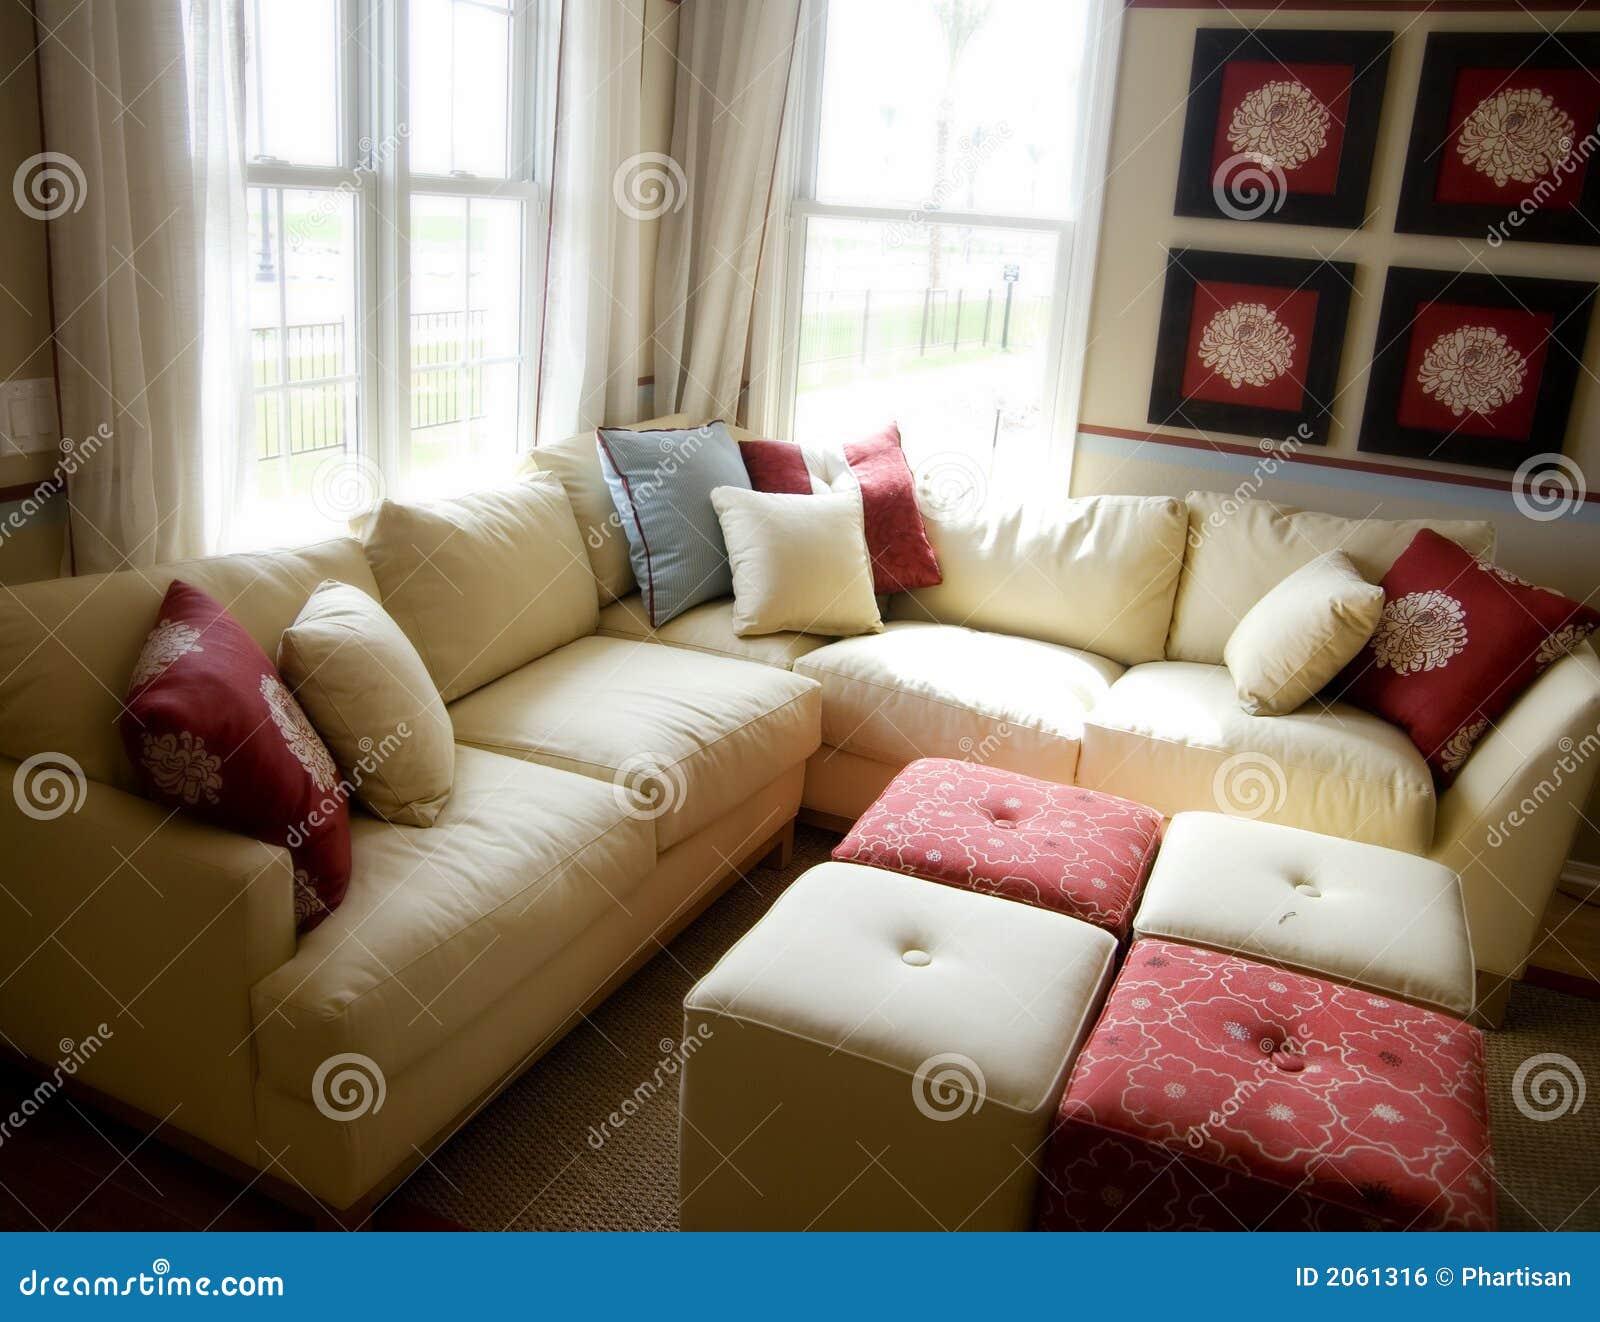 Model Home Interior Design Royalty Free Stock Image Image 2061316